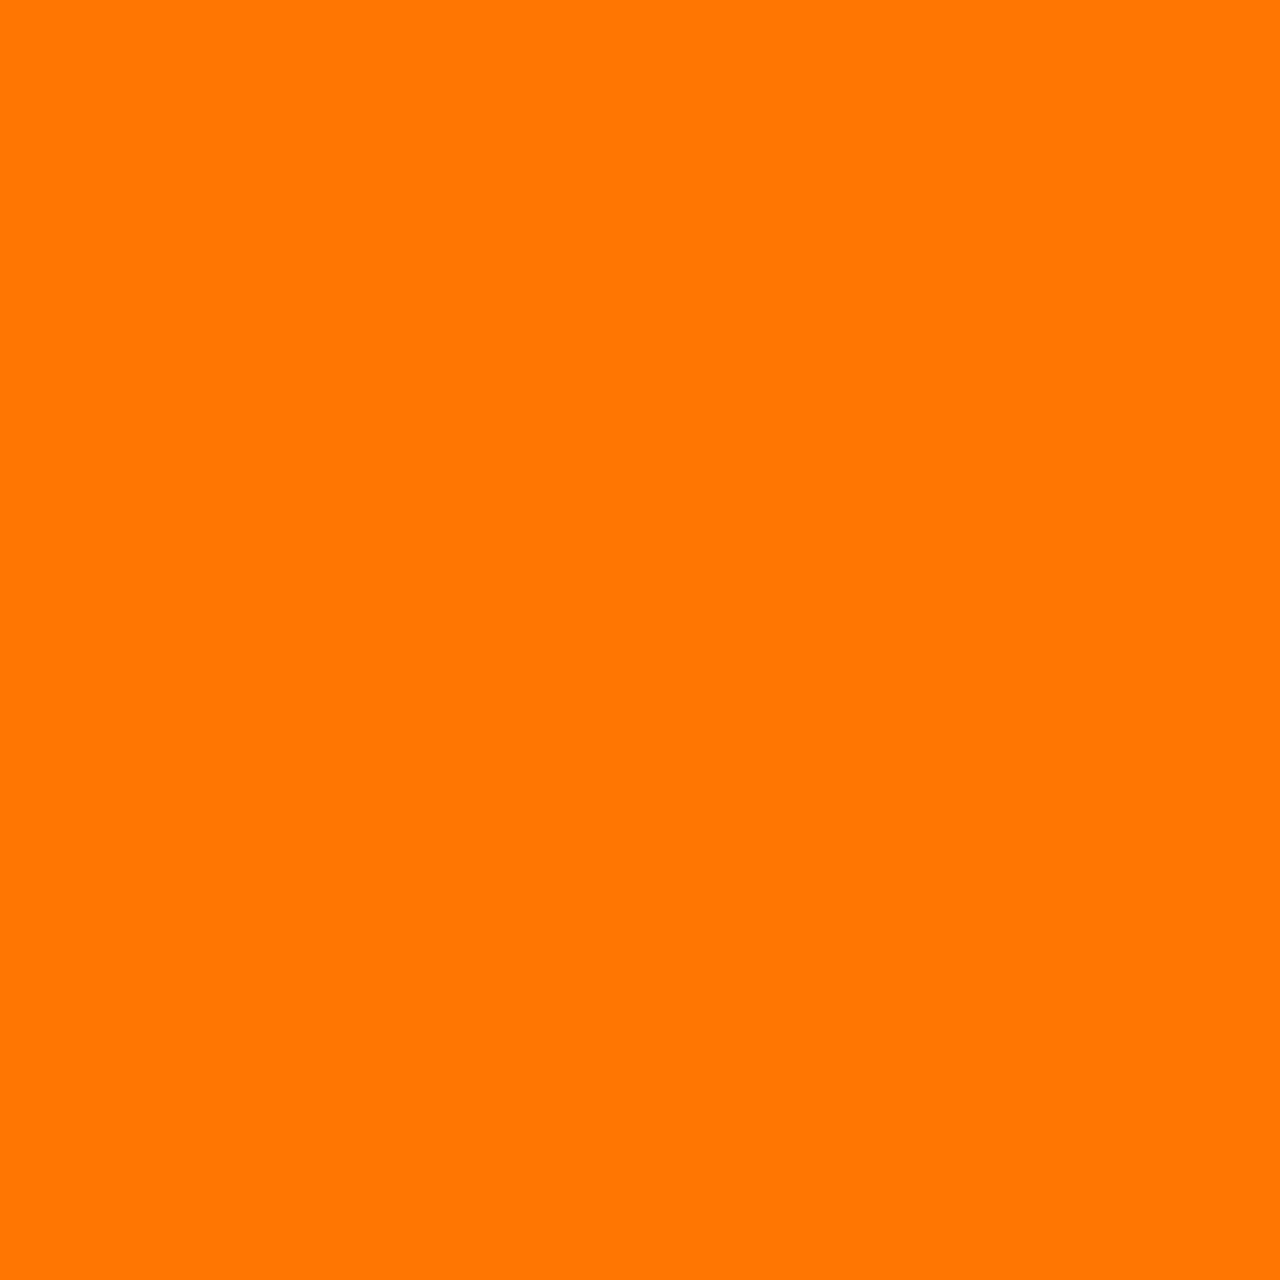 "#0021 Rosco Gels Roscolux Golden Amber, 20x24"""